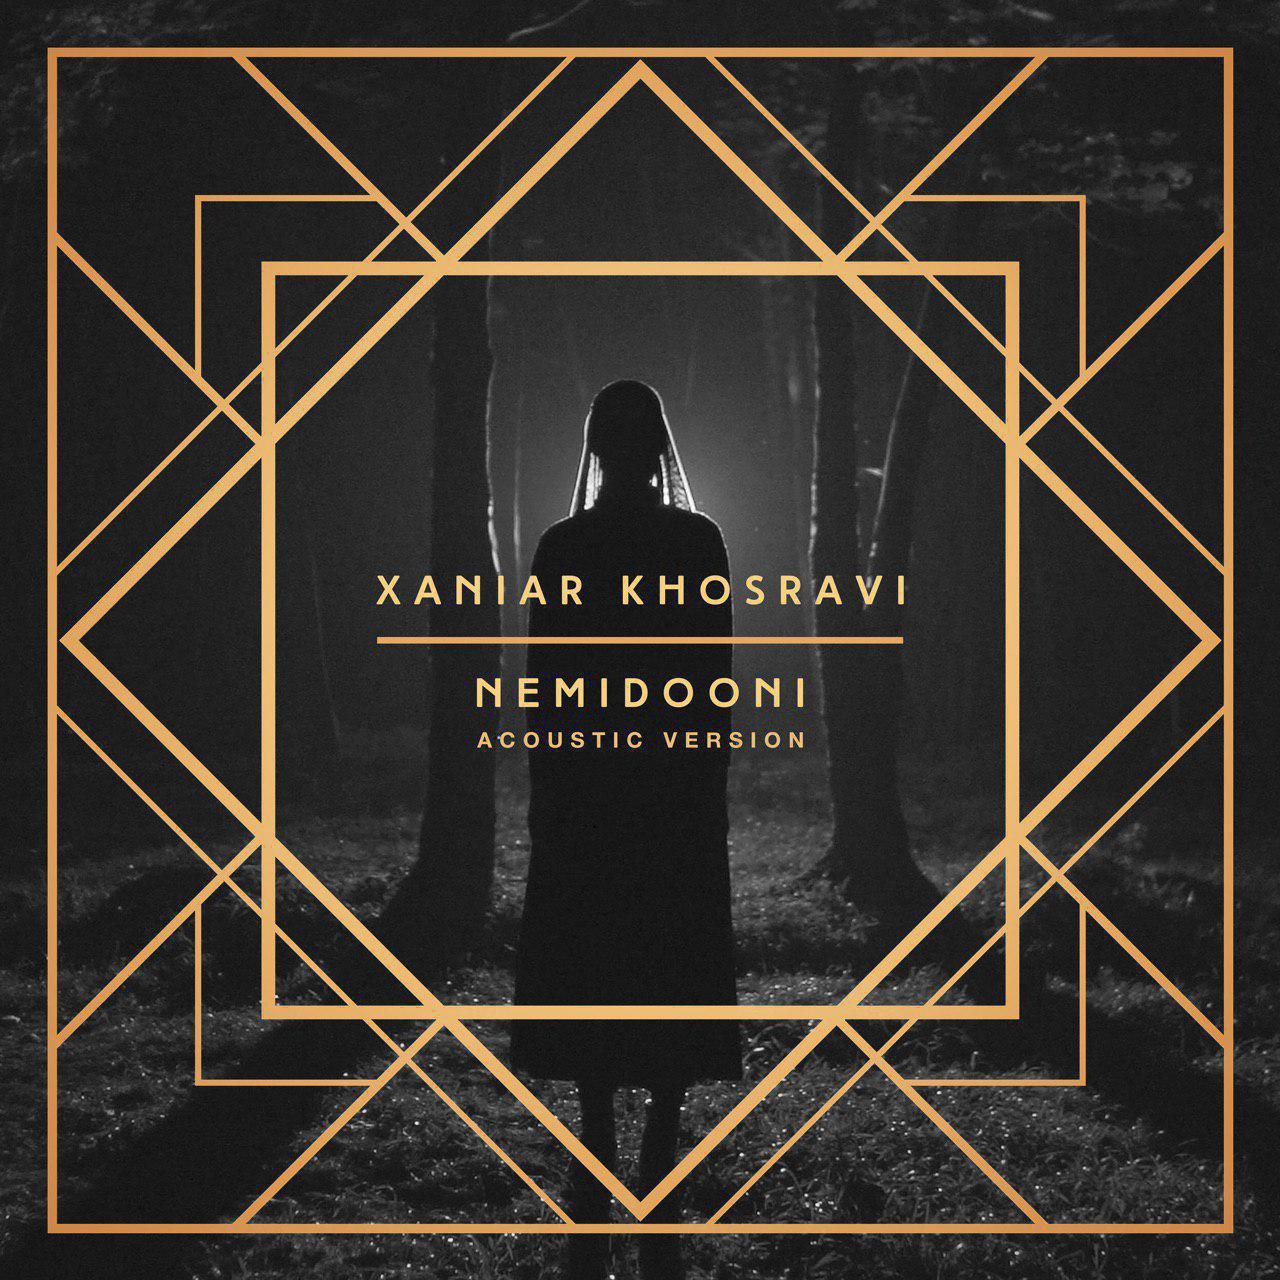 Xaniar Khosravi – Nemidooni (Acoustic Version)